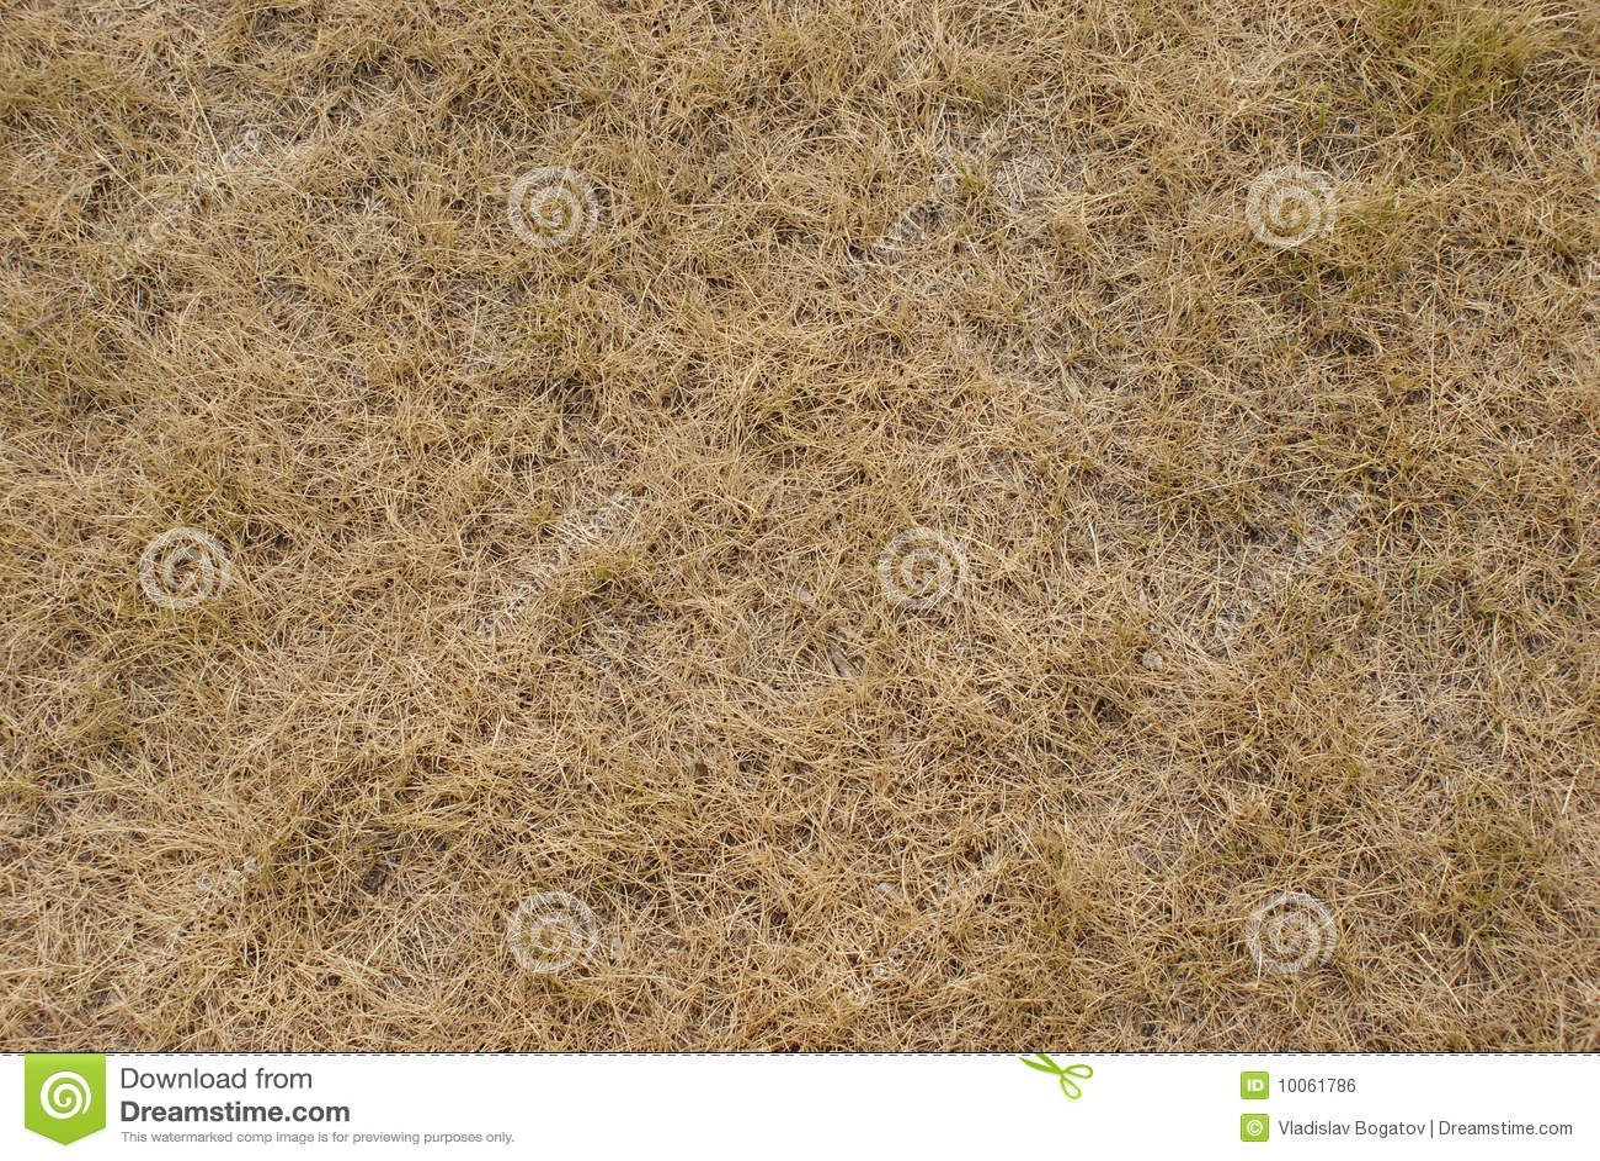 Textura da grama seca